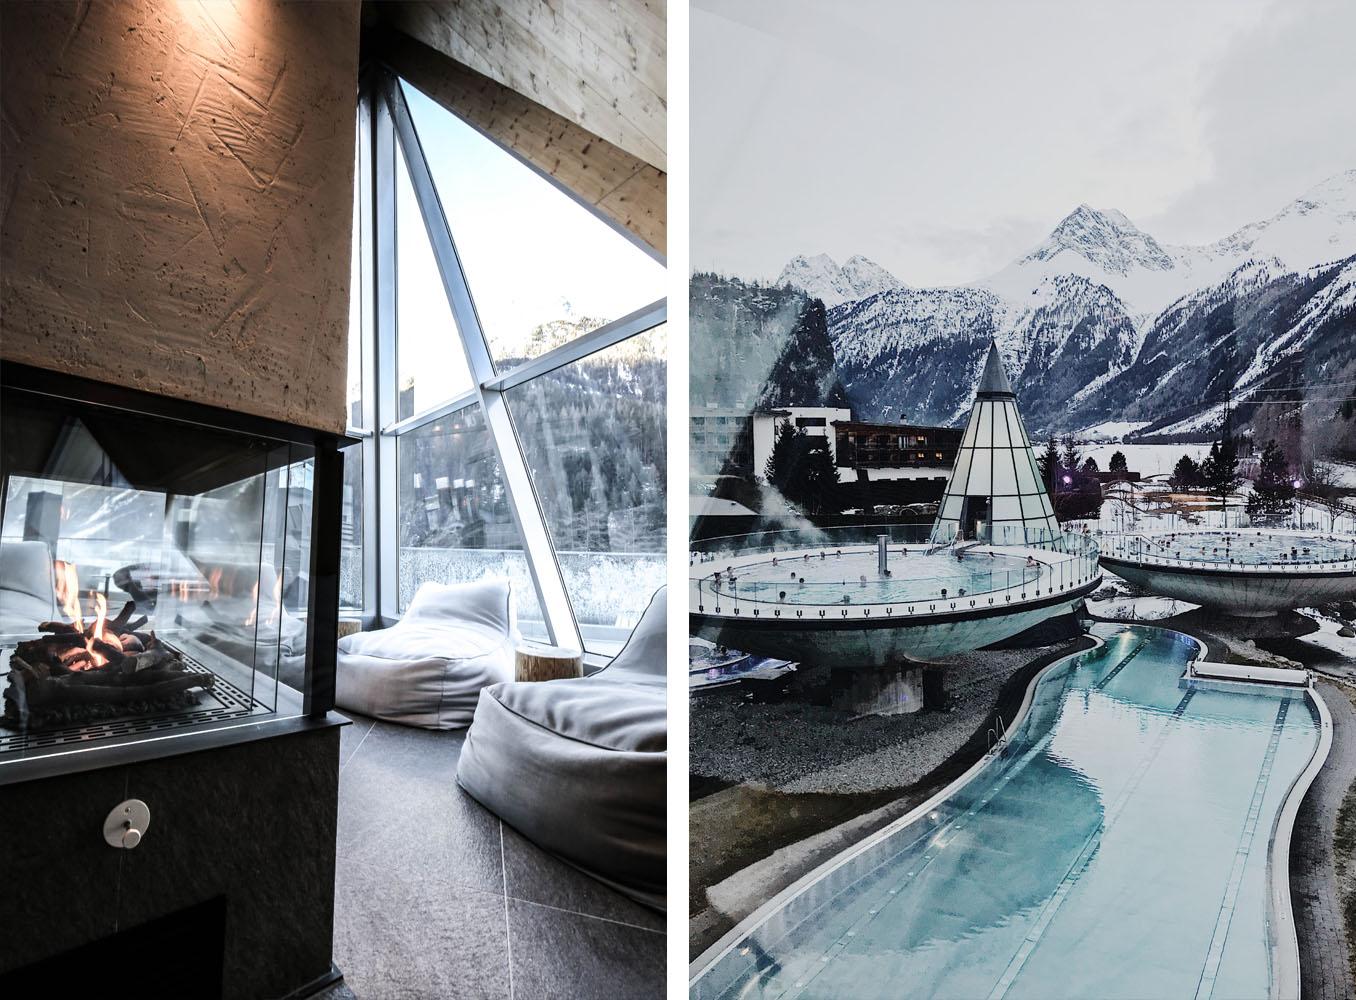 tensia beauty fashion blog berlin aqua dome tirol. Black Bedroom Furniture Sets. Home Design Ideas